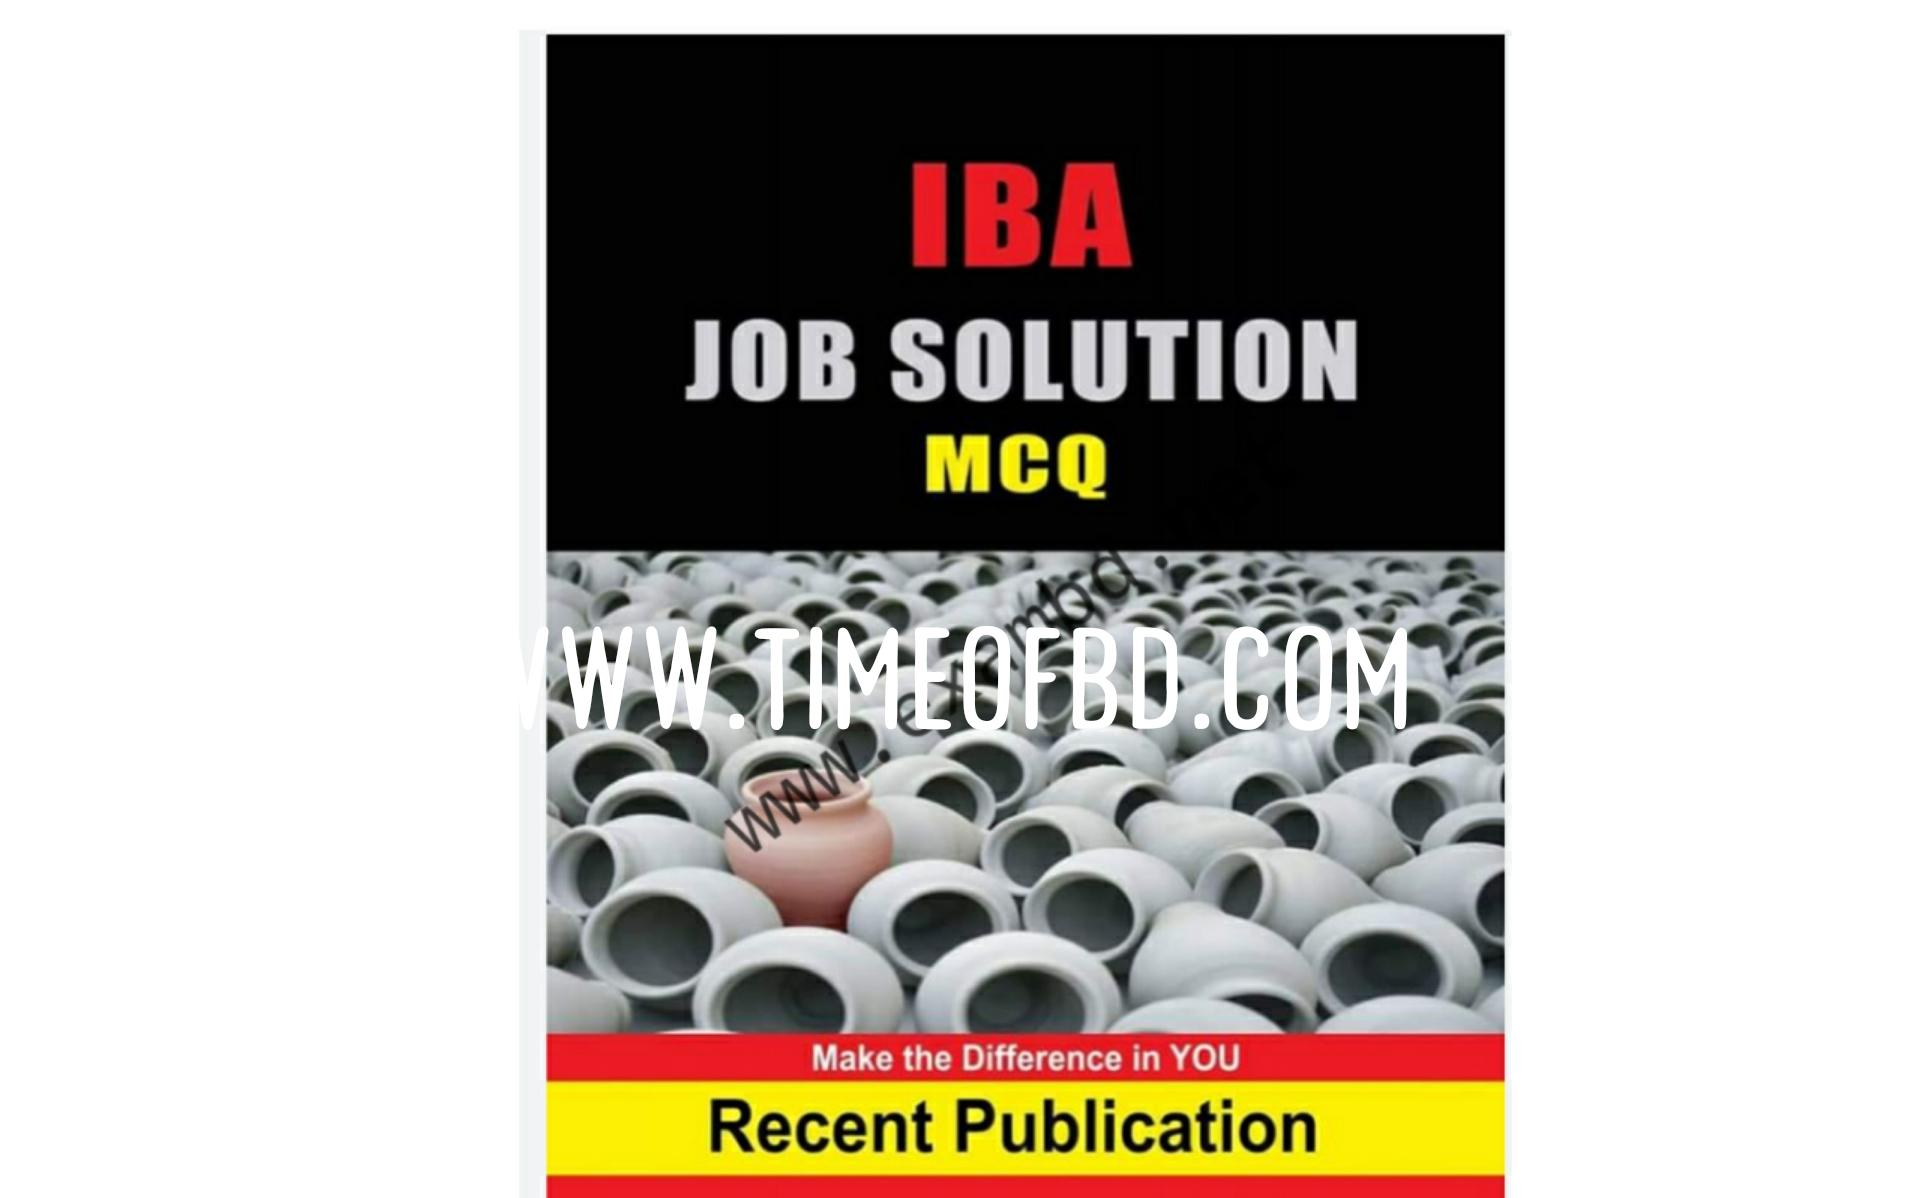 Iba job solution mcq pdf download link,Iba job solution mcq pdf, Iba job solution mcq,Iba job solution book,Iba job solution model test